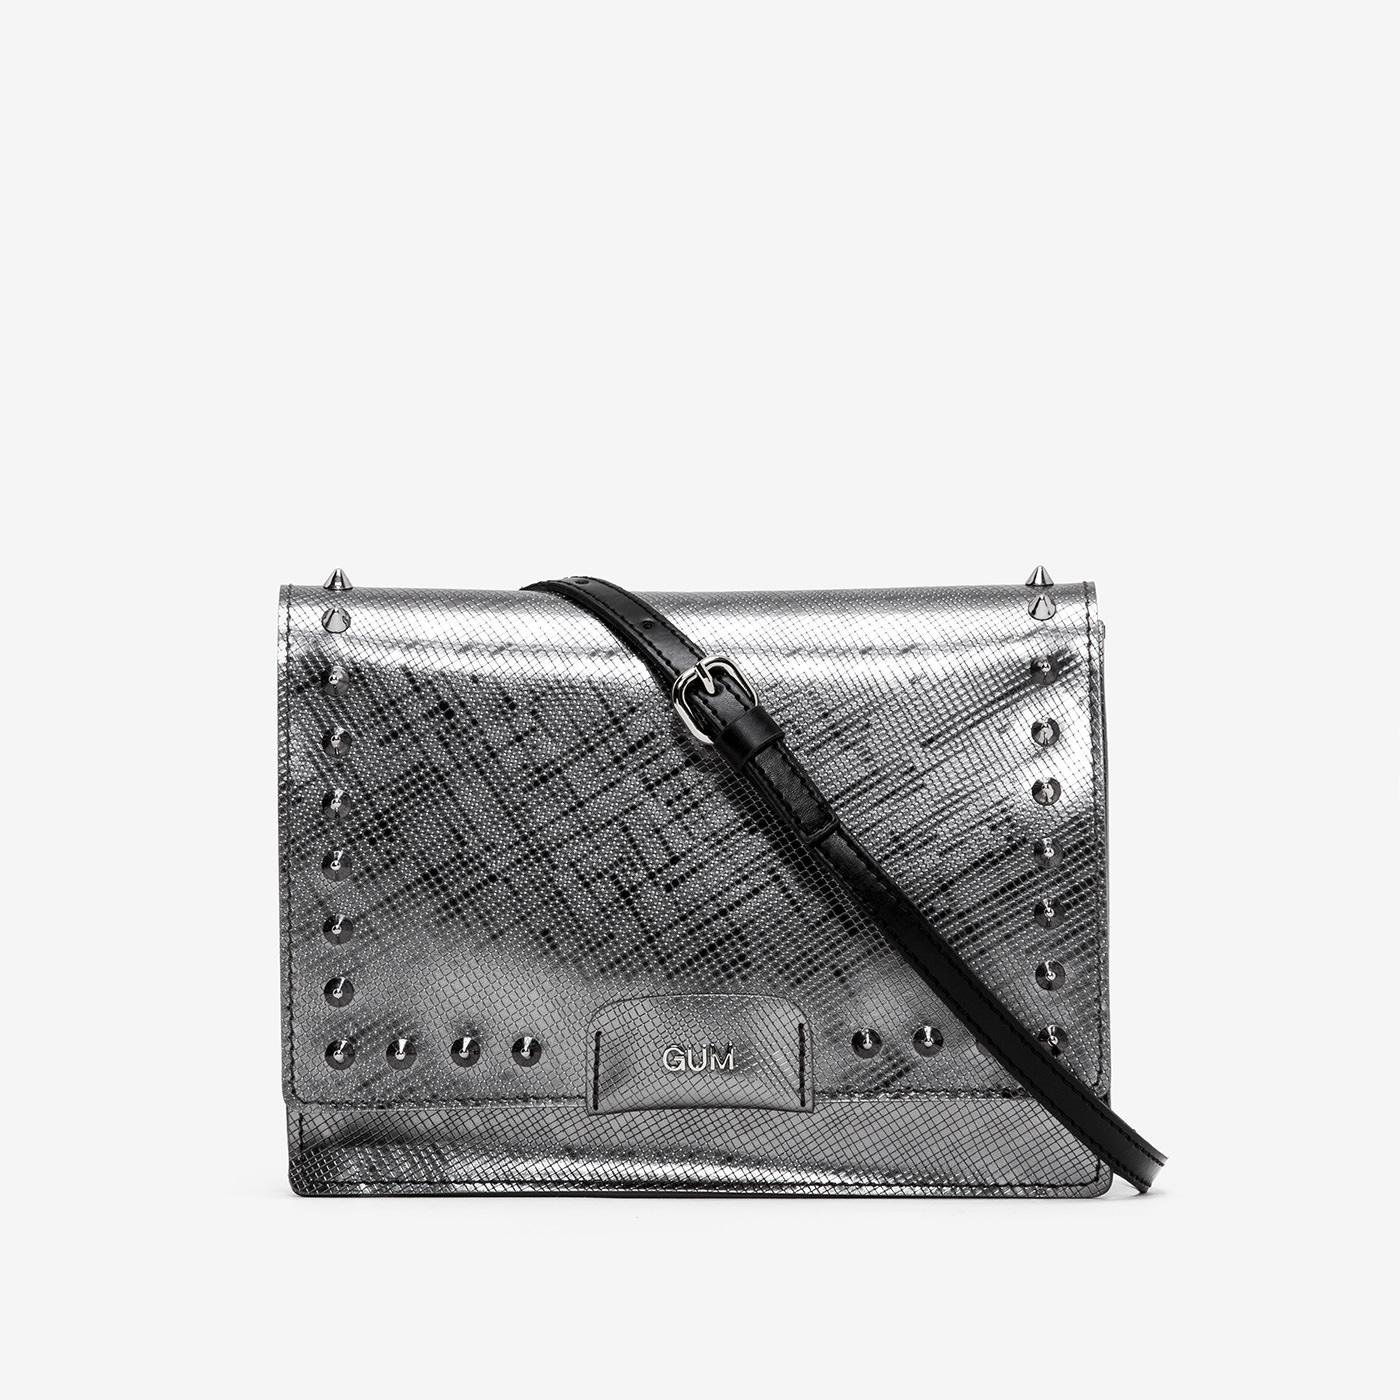 GUM: MINI DOLLY BAG